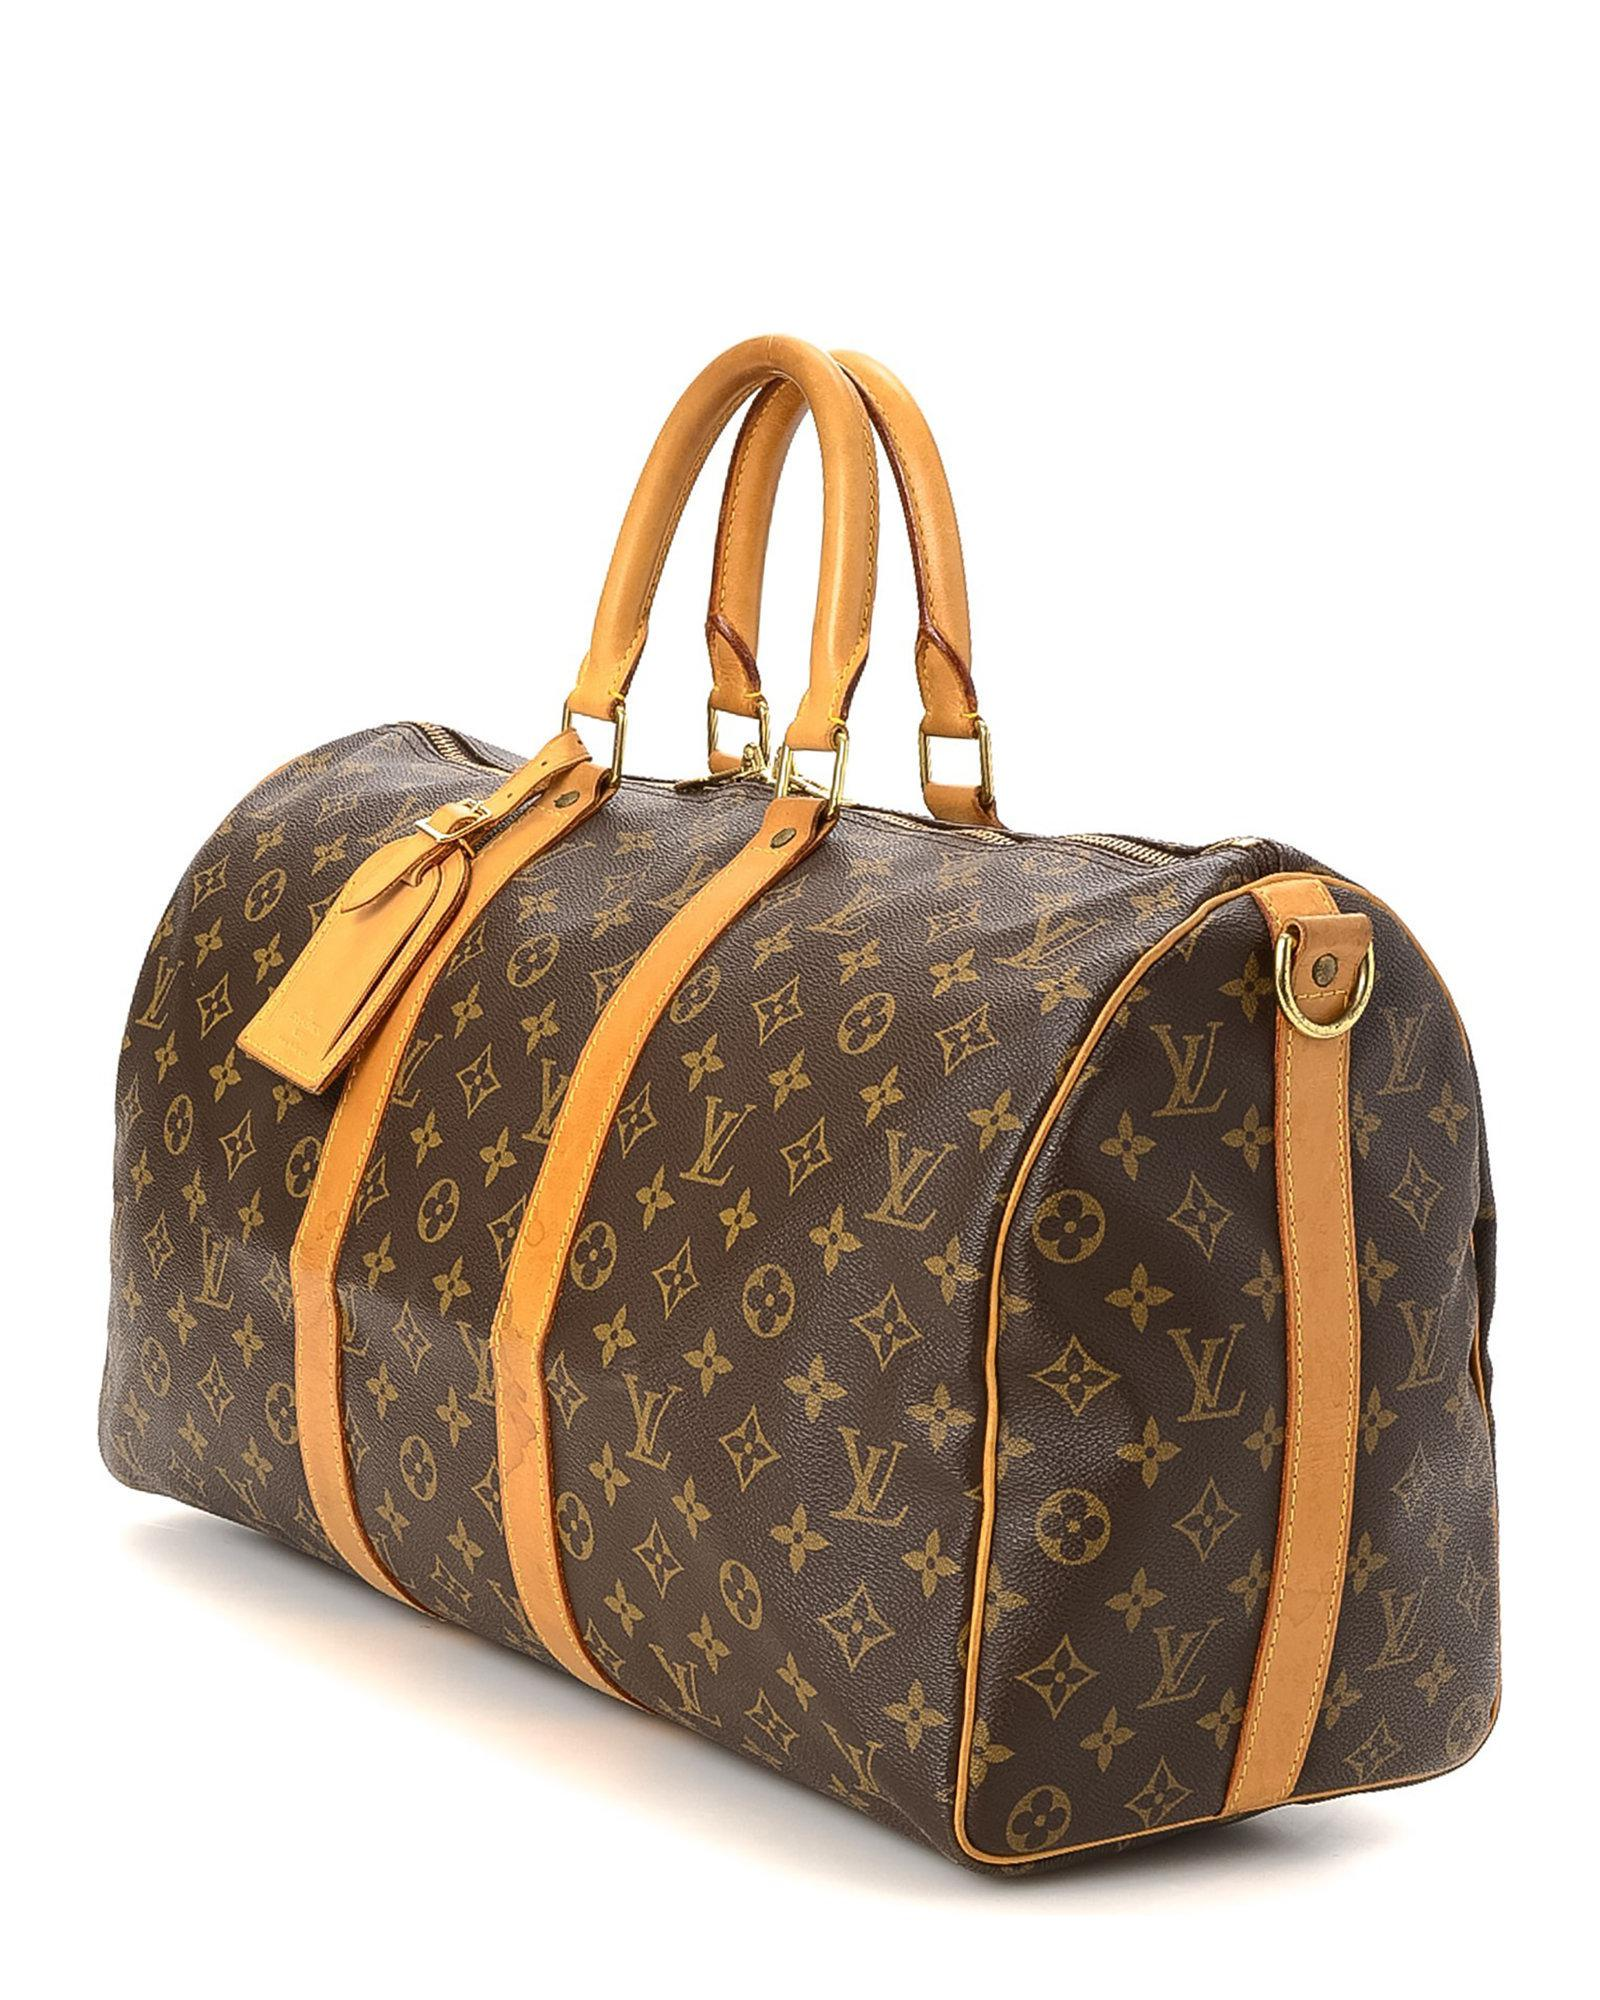 ed4b726422ee Lyst - Louis Vuitton Keepall 45 Bandouliere Travel Bag - Vintage in Brown